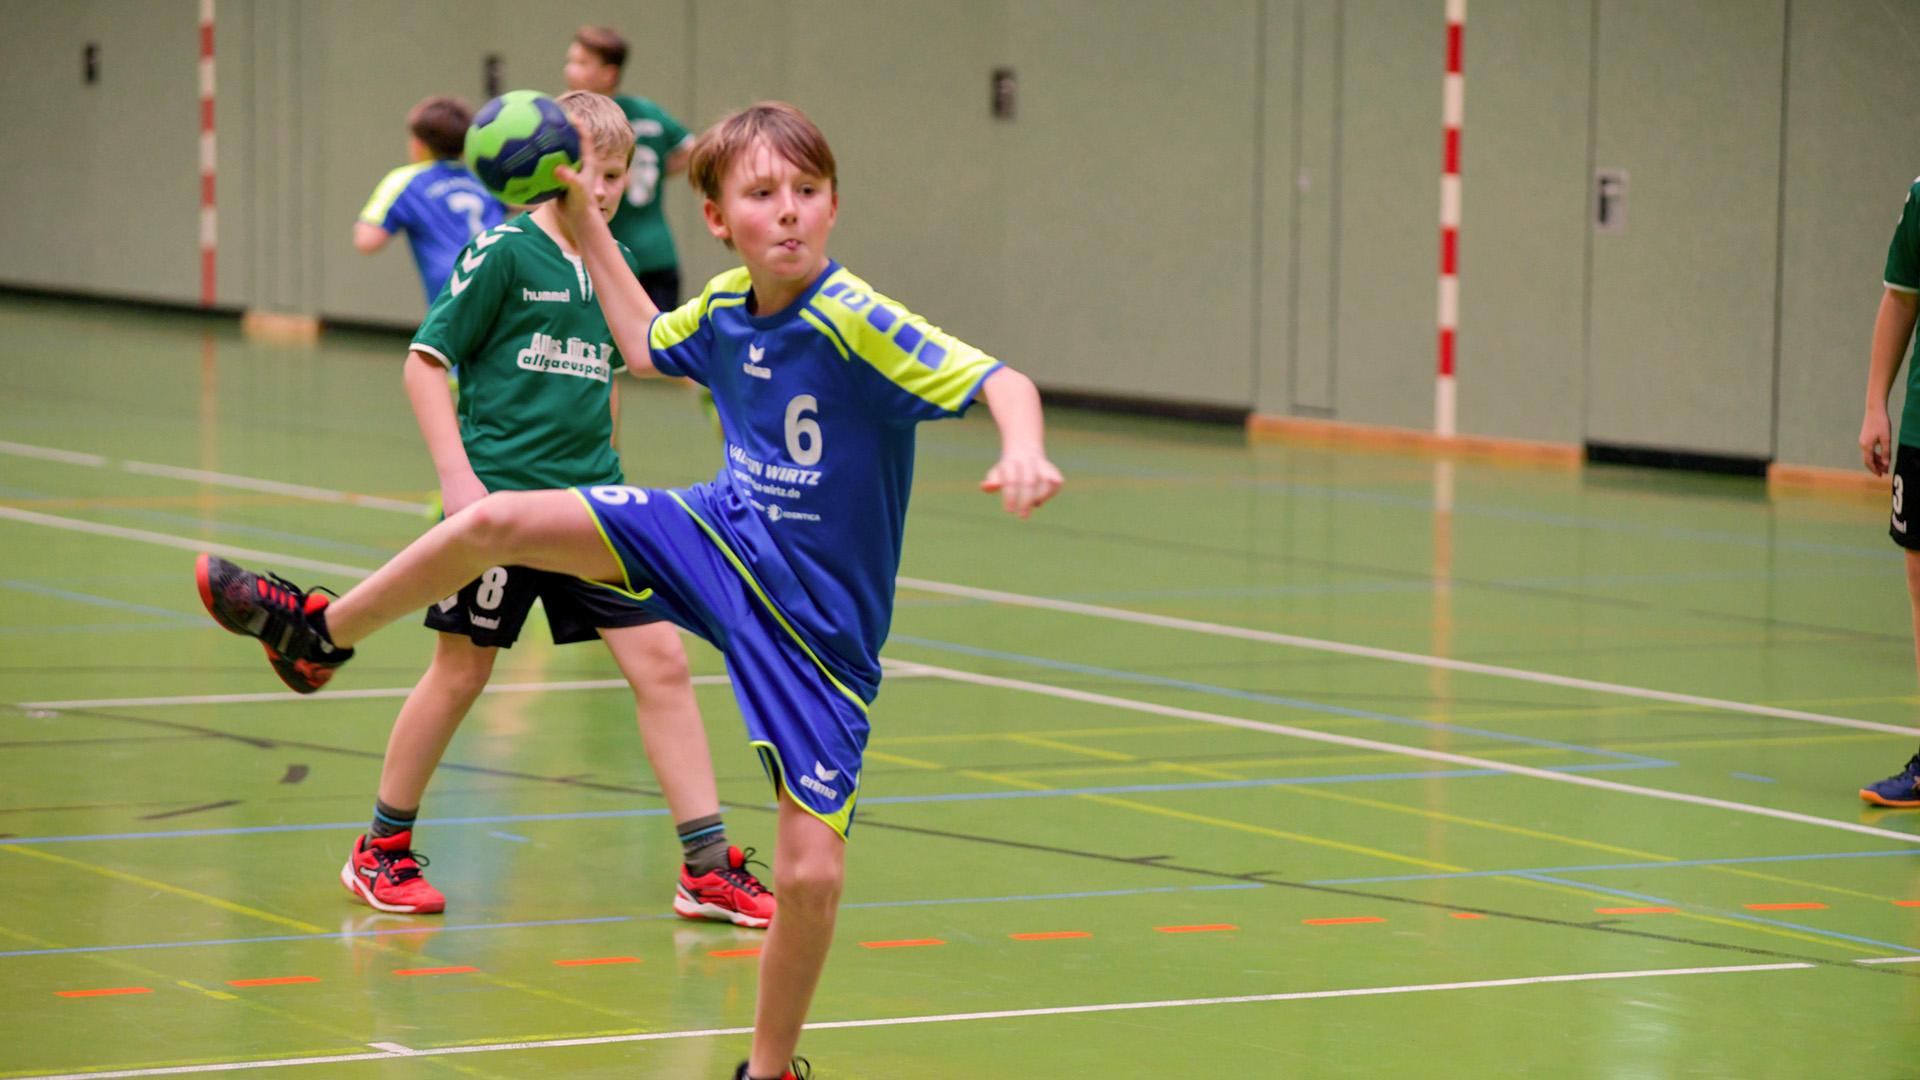 017Slider_mD_tsg_leutkirch_handball